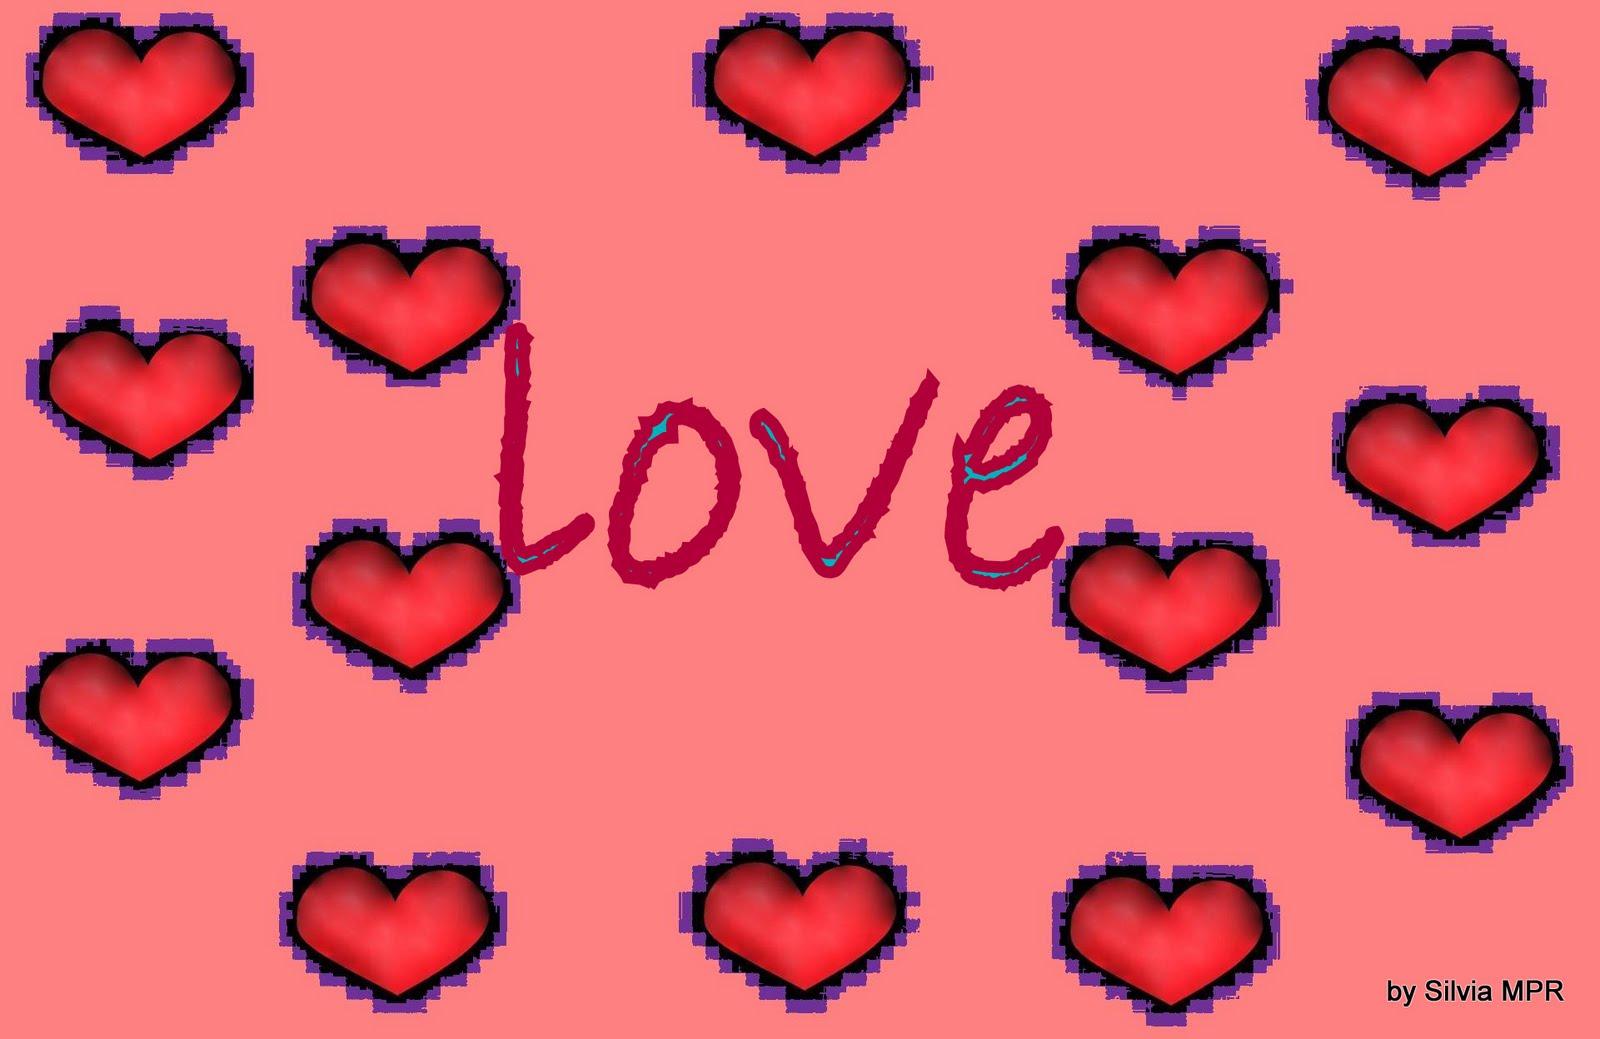 Dibujos De Amor: PZ C: Corazones